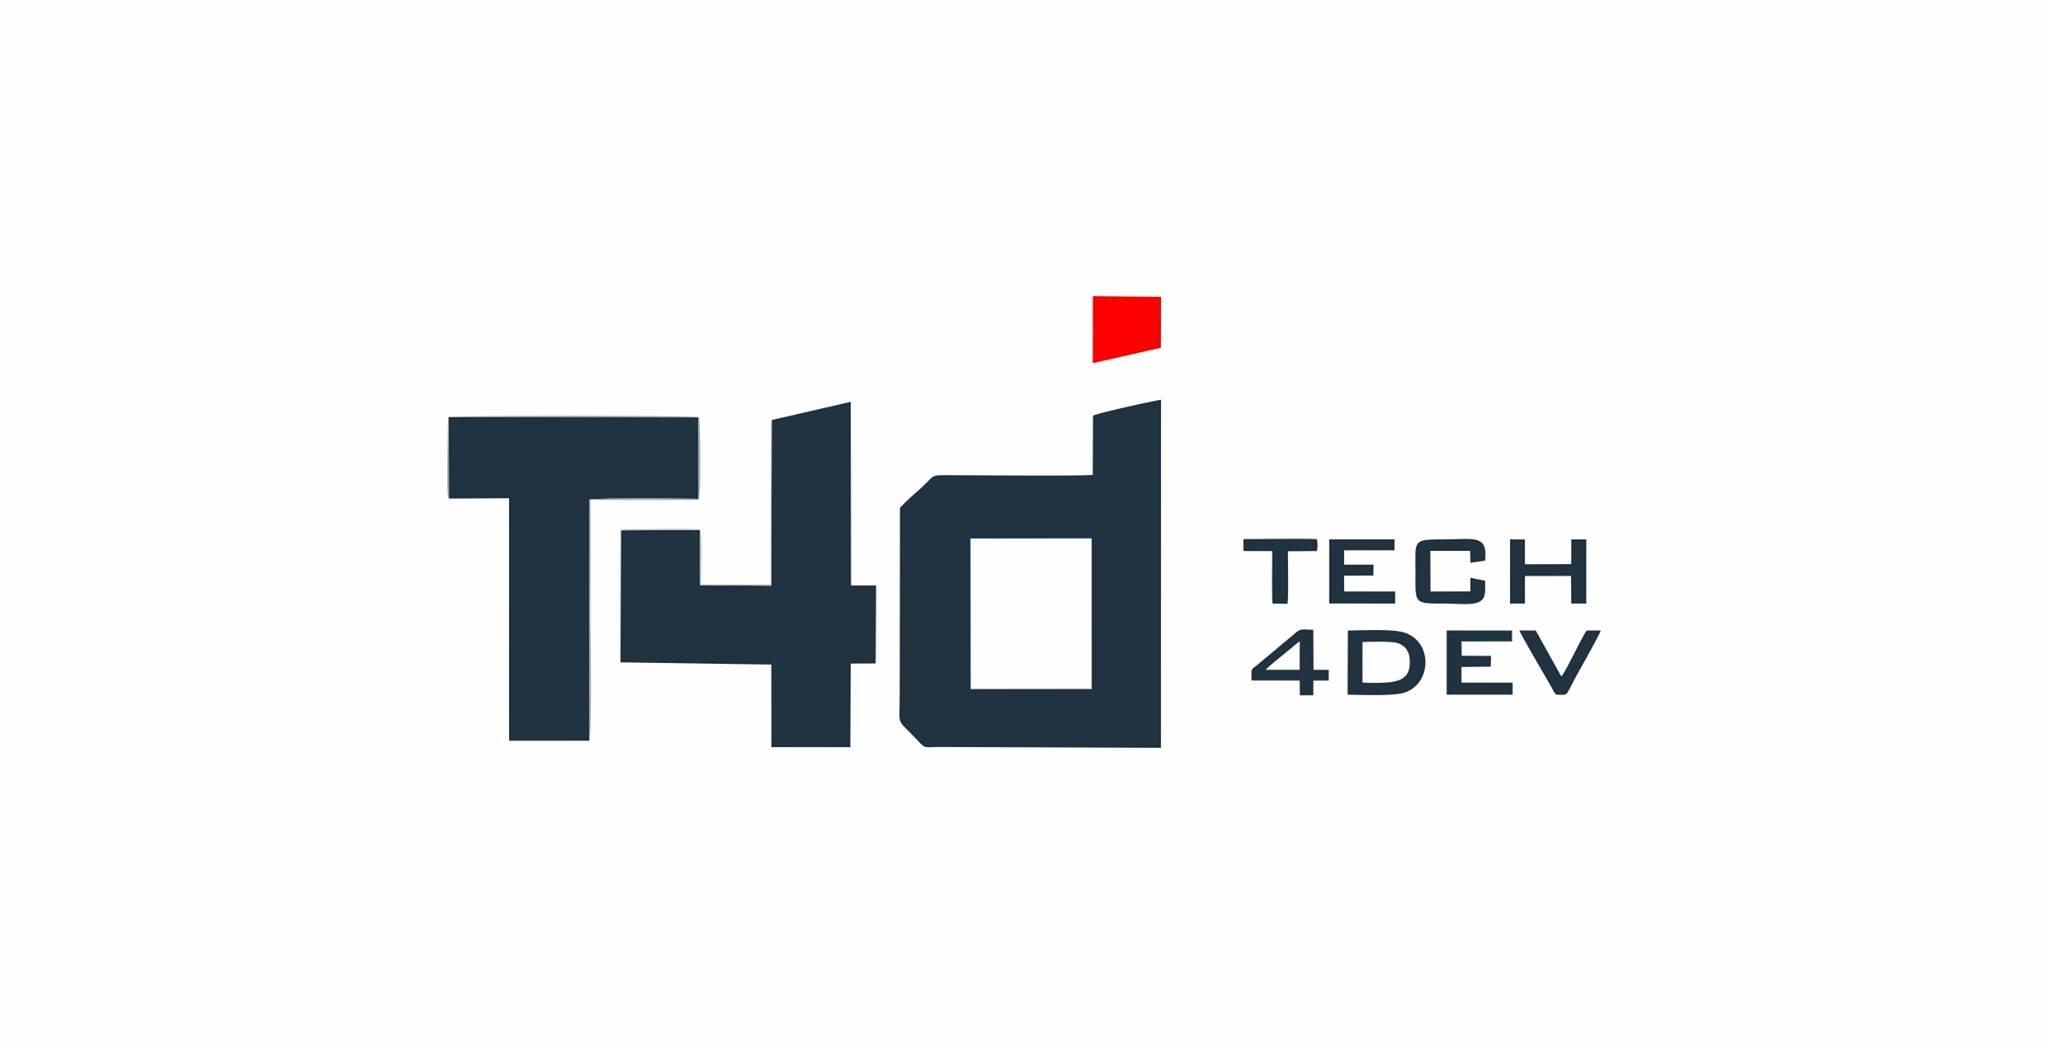 Tech4Dev IAmAWomanTechster Campaign